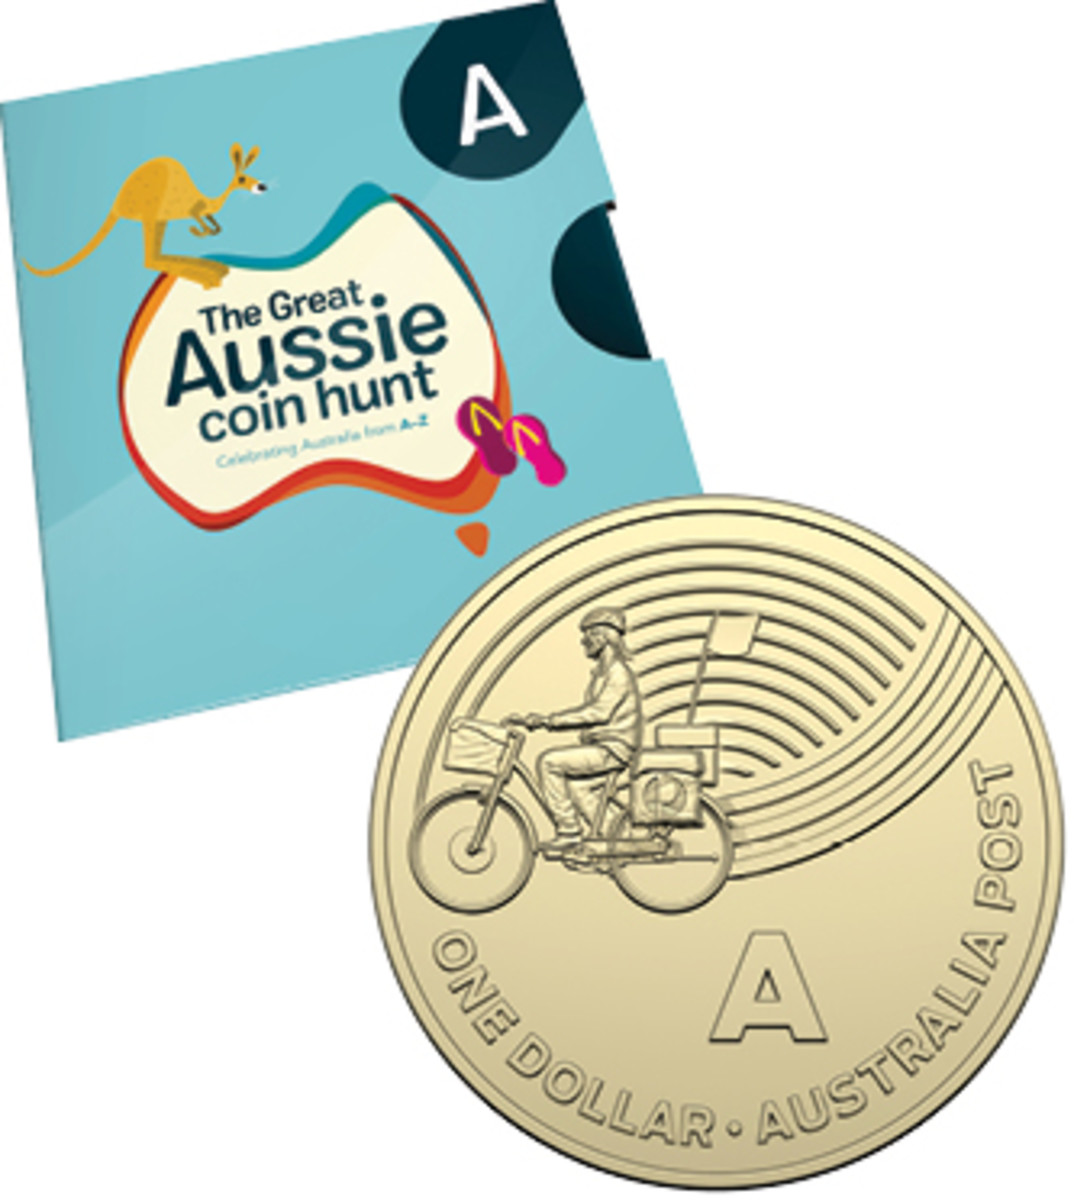 (Images courtesy Royal Australian Mint.)